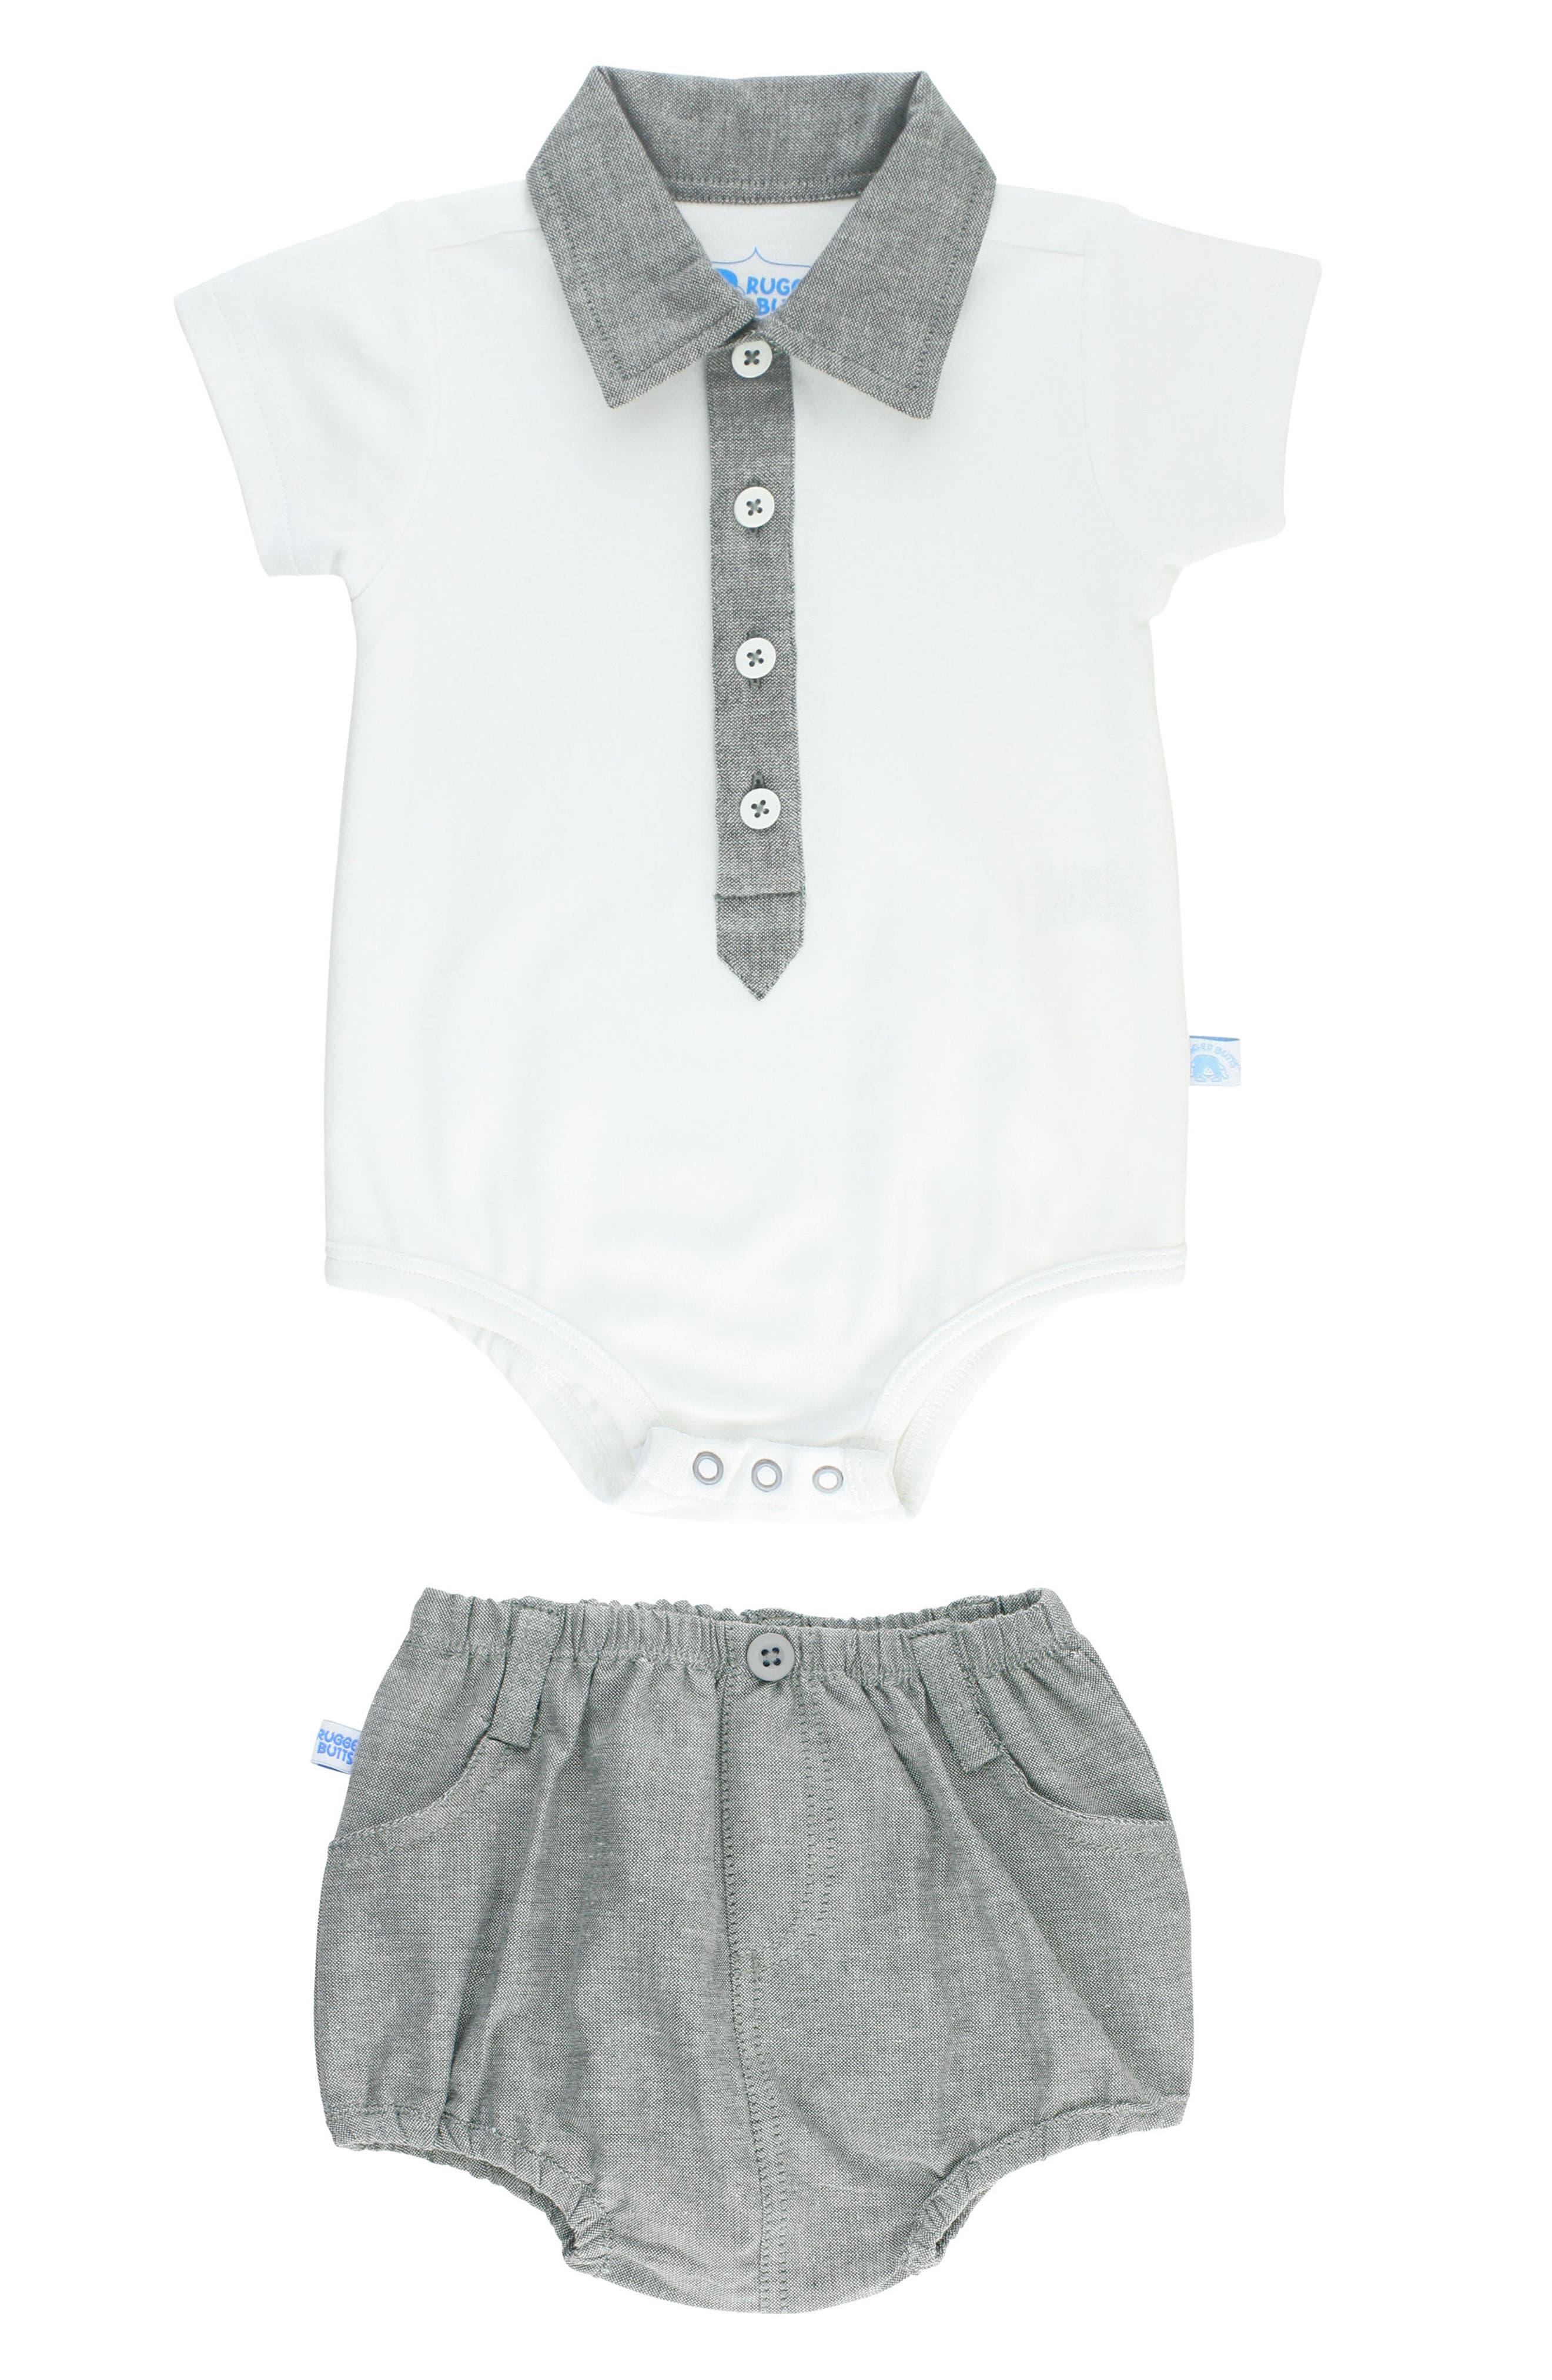 Main Image - RuggedButts Polo Bodysuit & Chambray Shorts Set (Baby Boys)